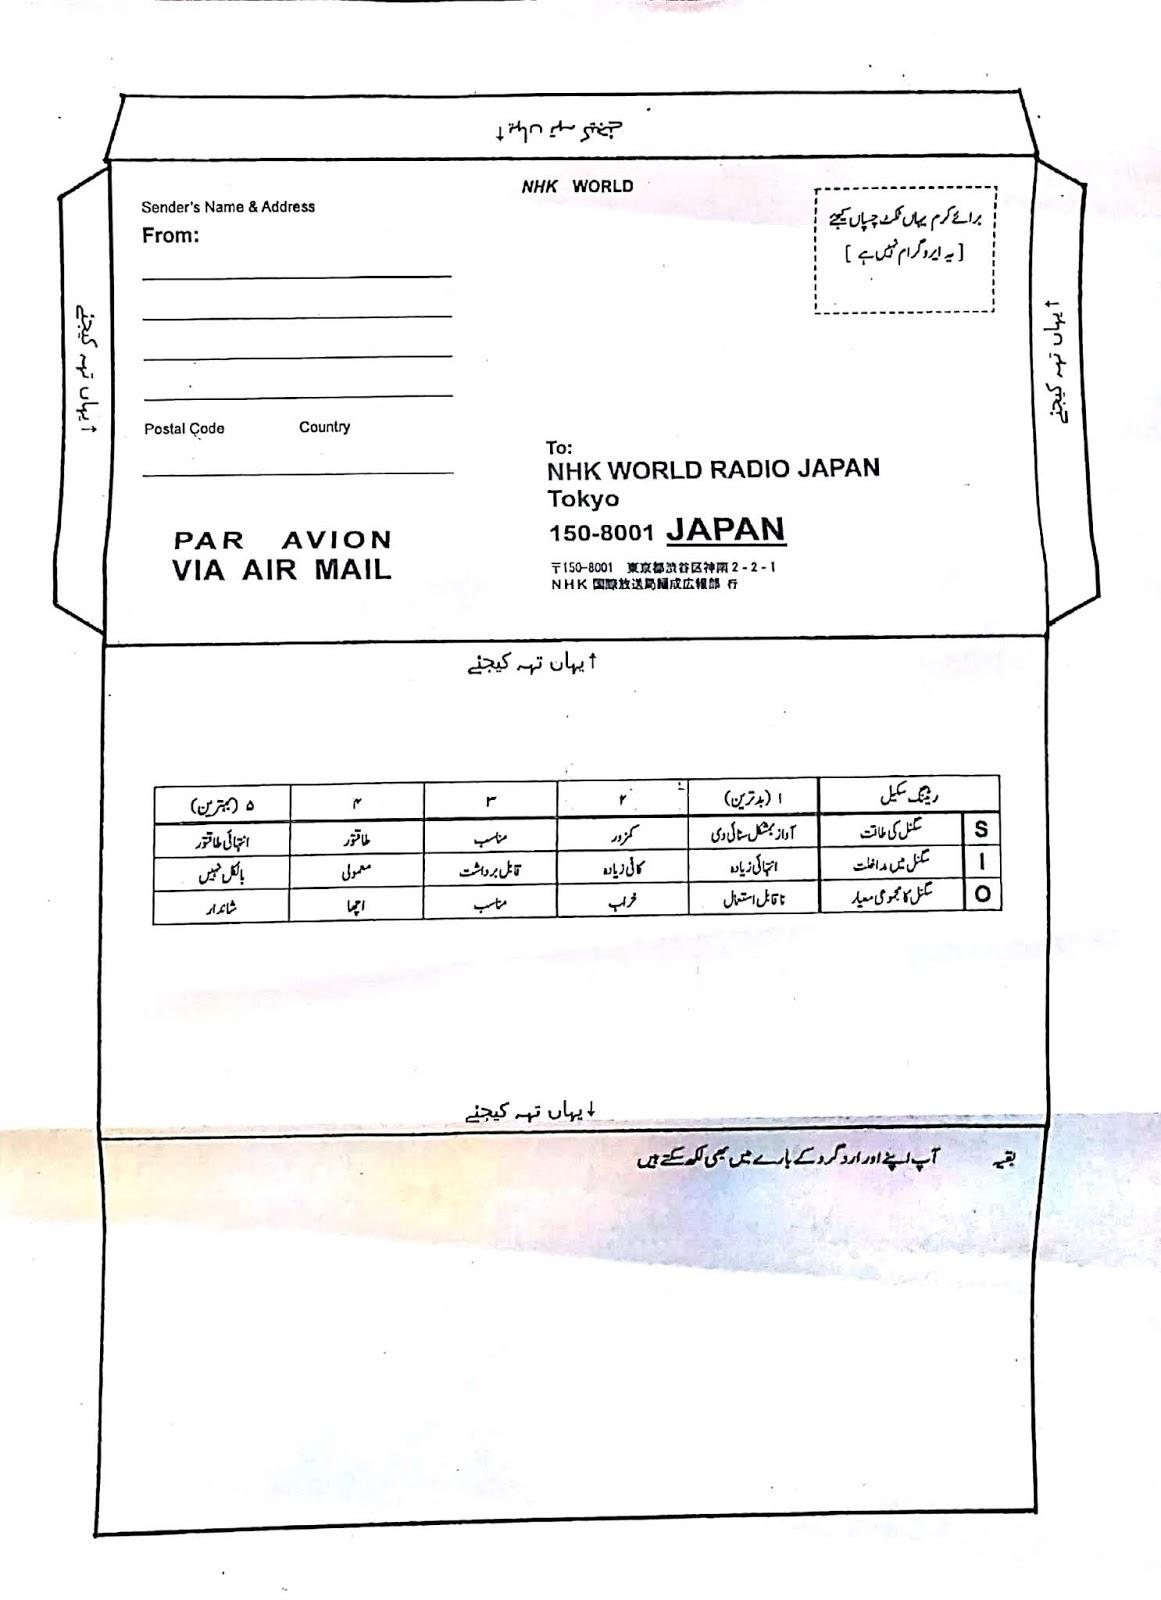 Reception forms